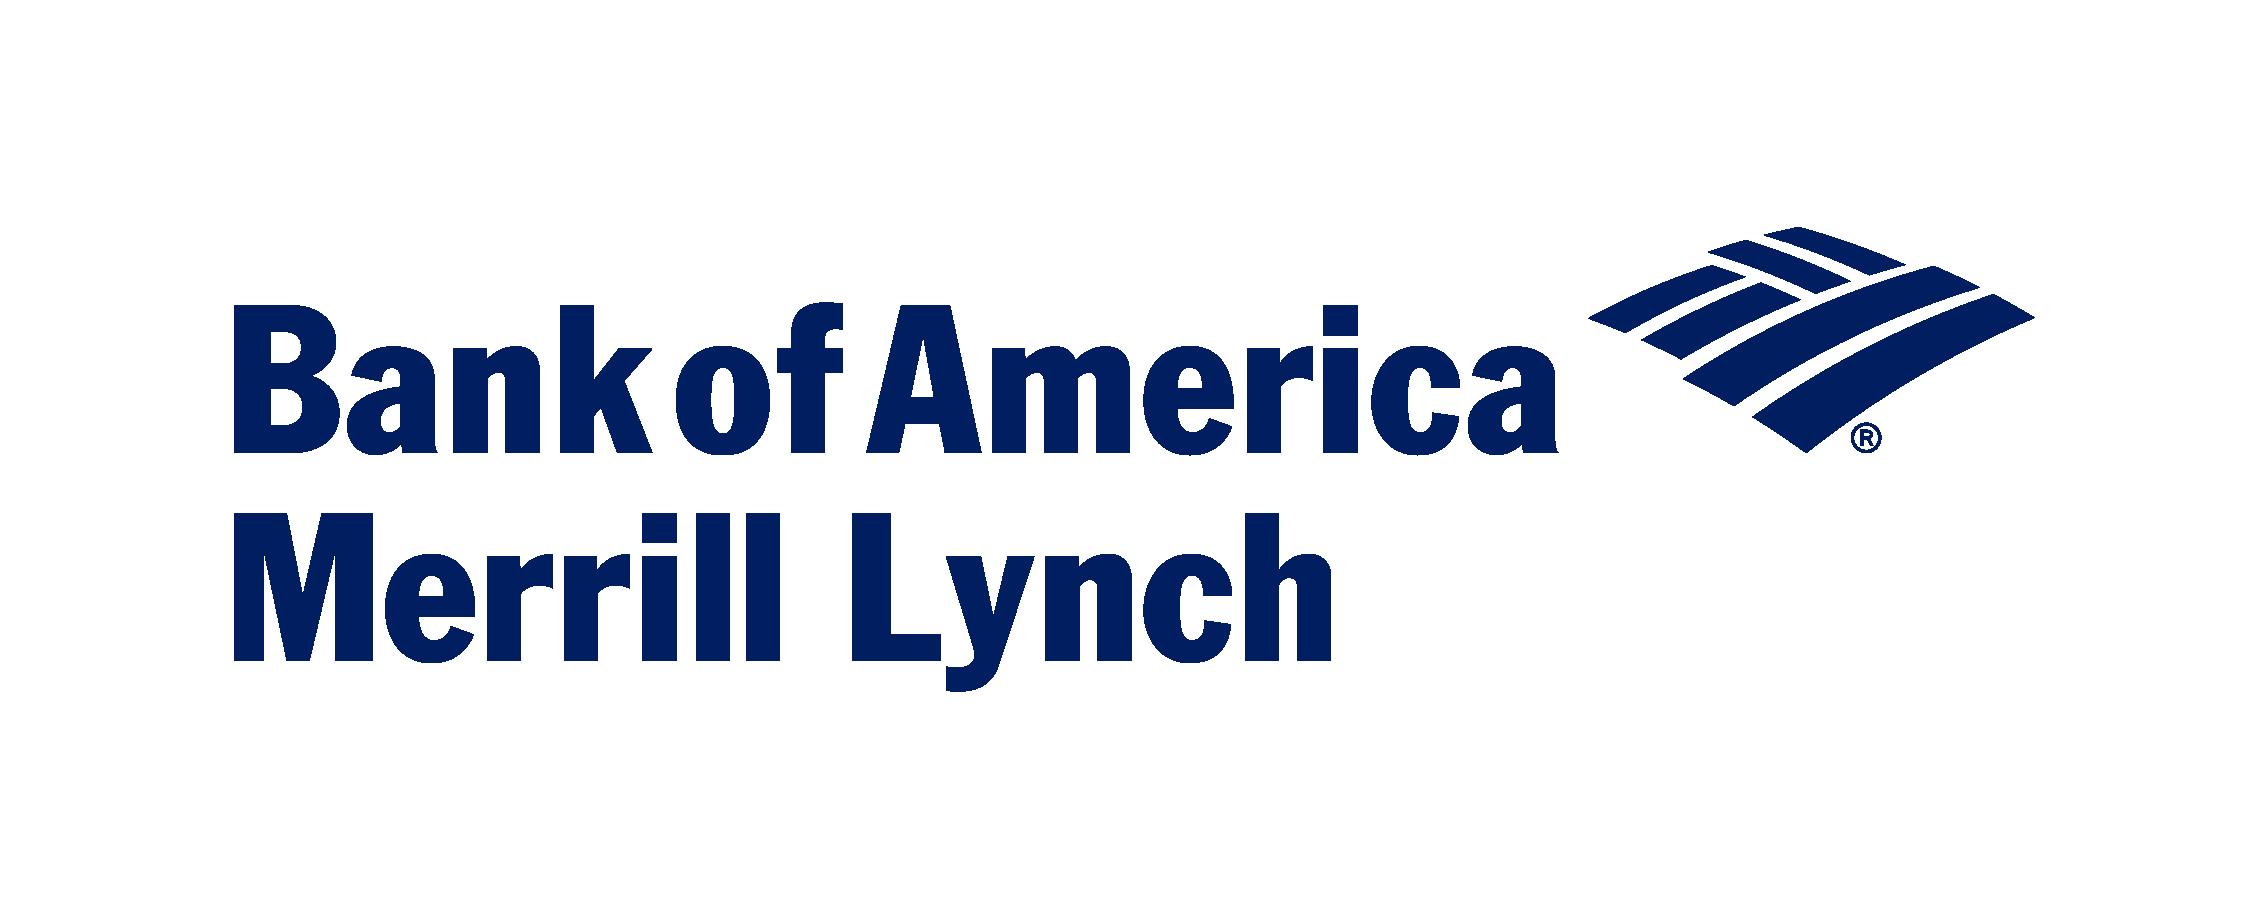 Bank_of_America_Merrill_Lynch_signature_RGB_300